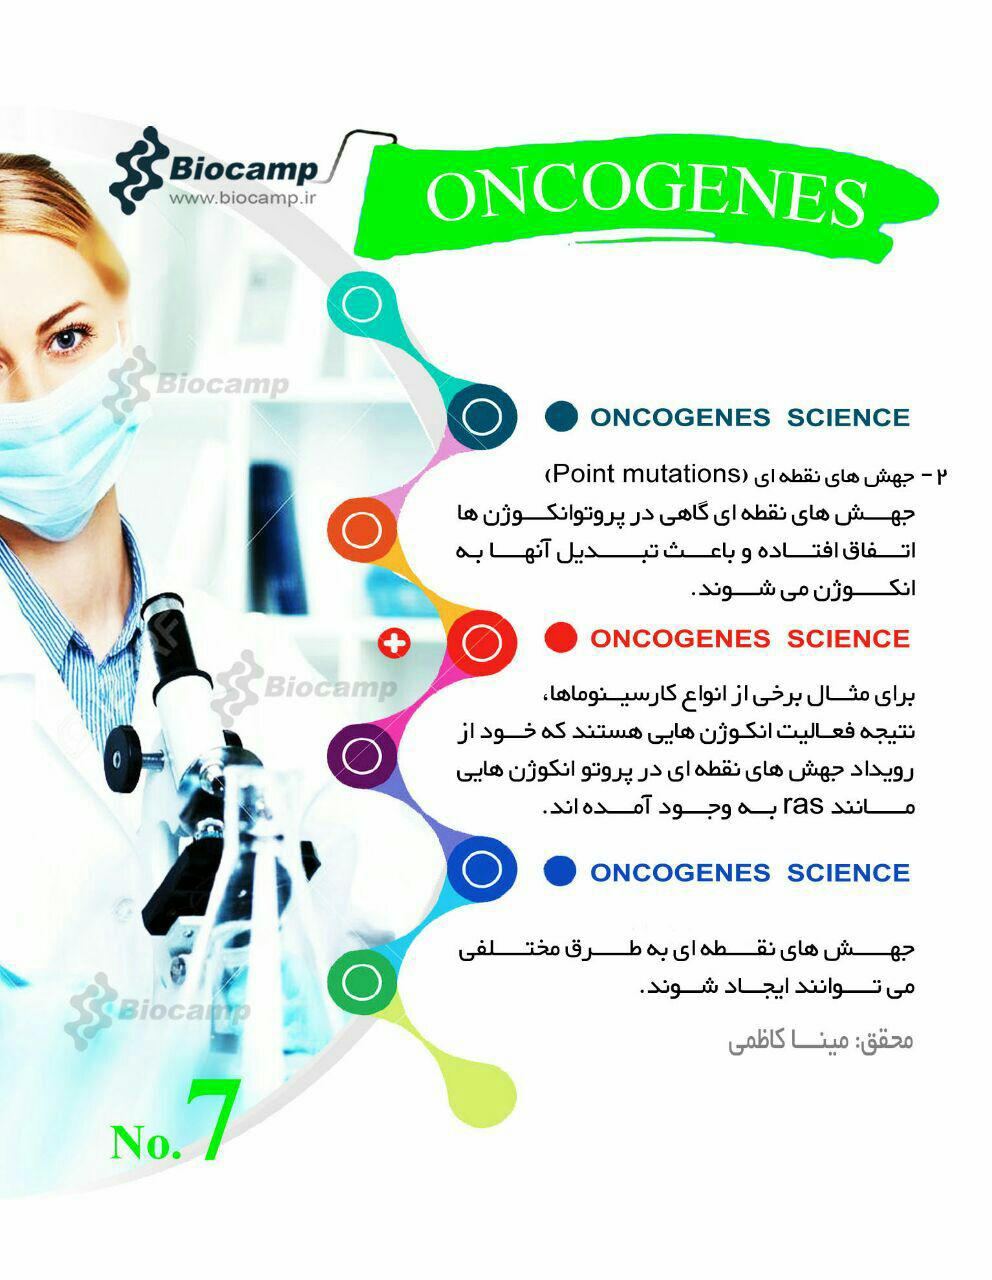 انکوژن انکوژن چیست؟ اینفوگرافی انکوژن چیست؟ اینفوگرافی photo 2016 09 12 21 16 22